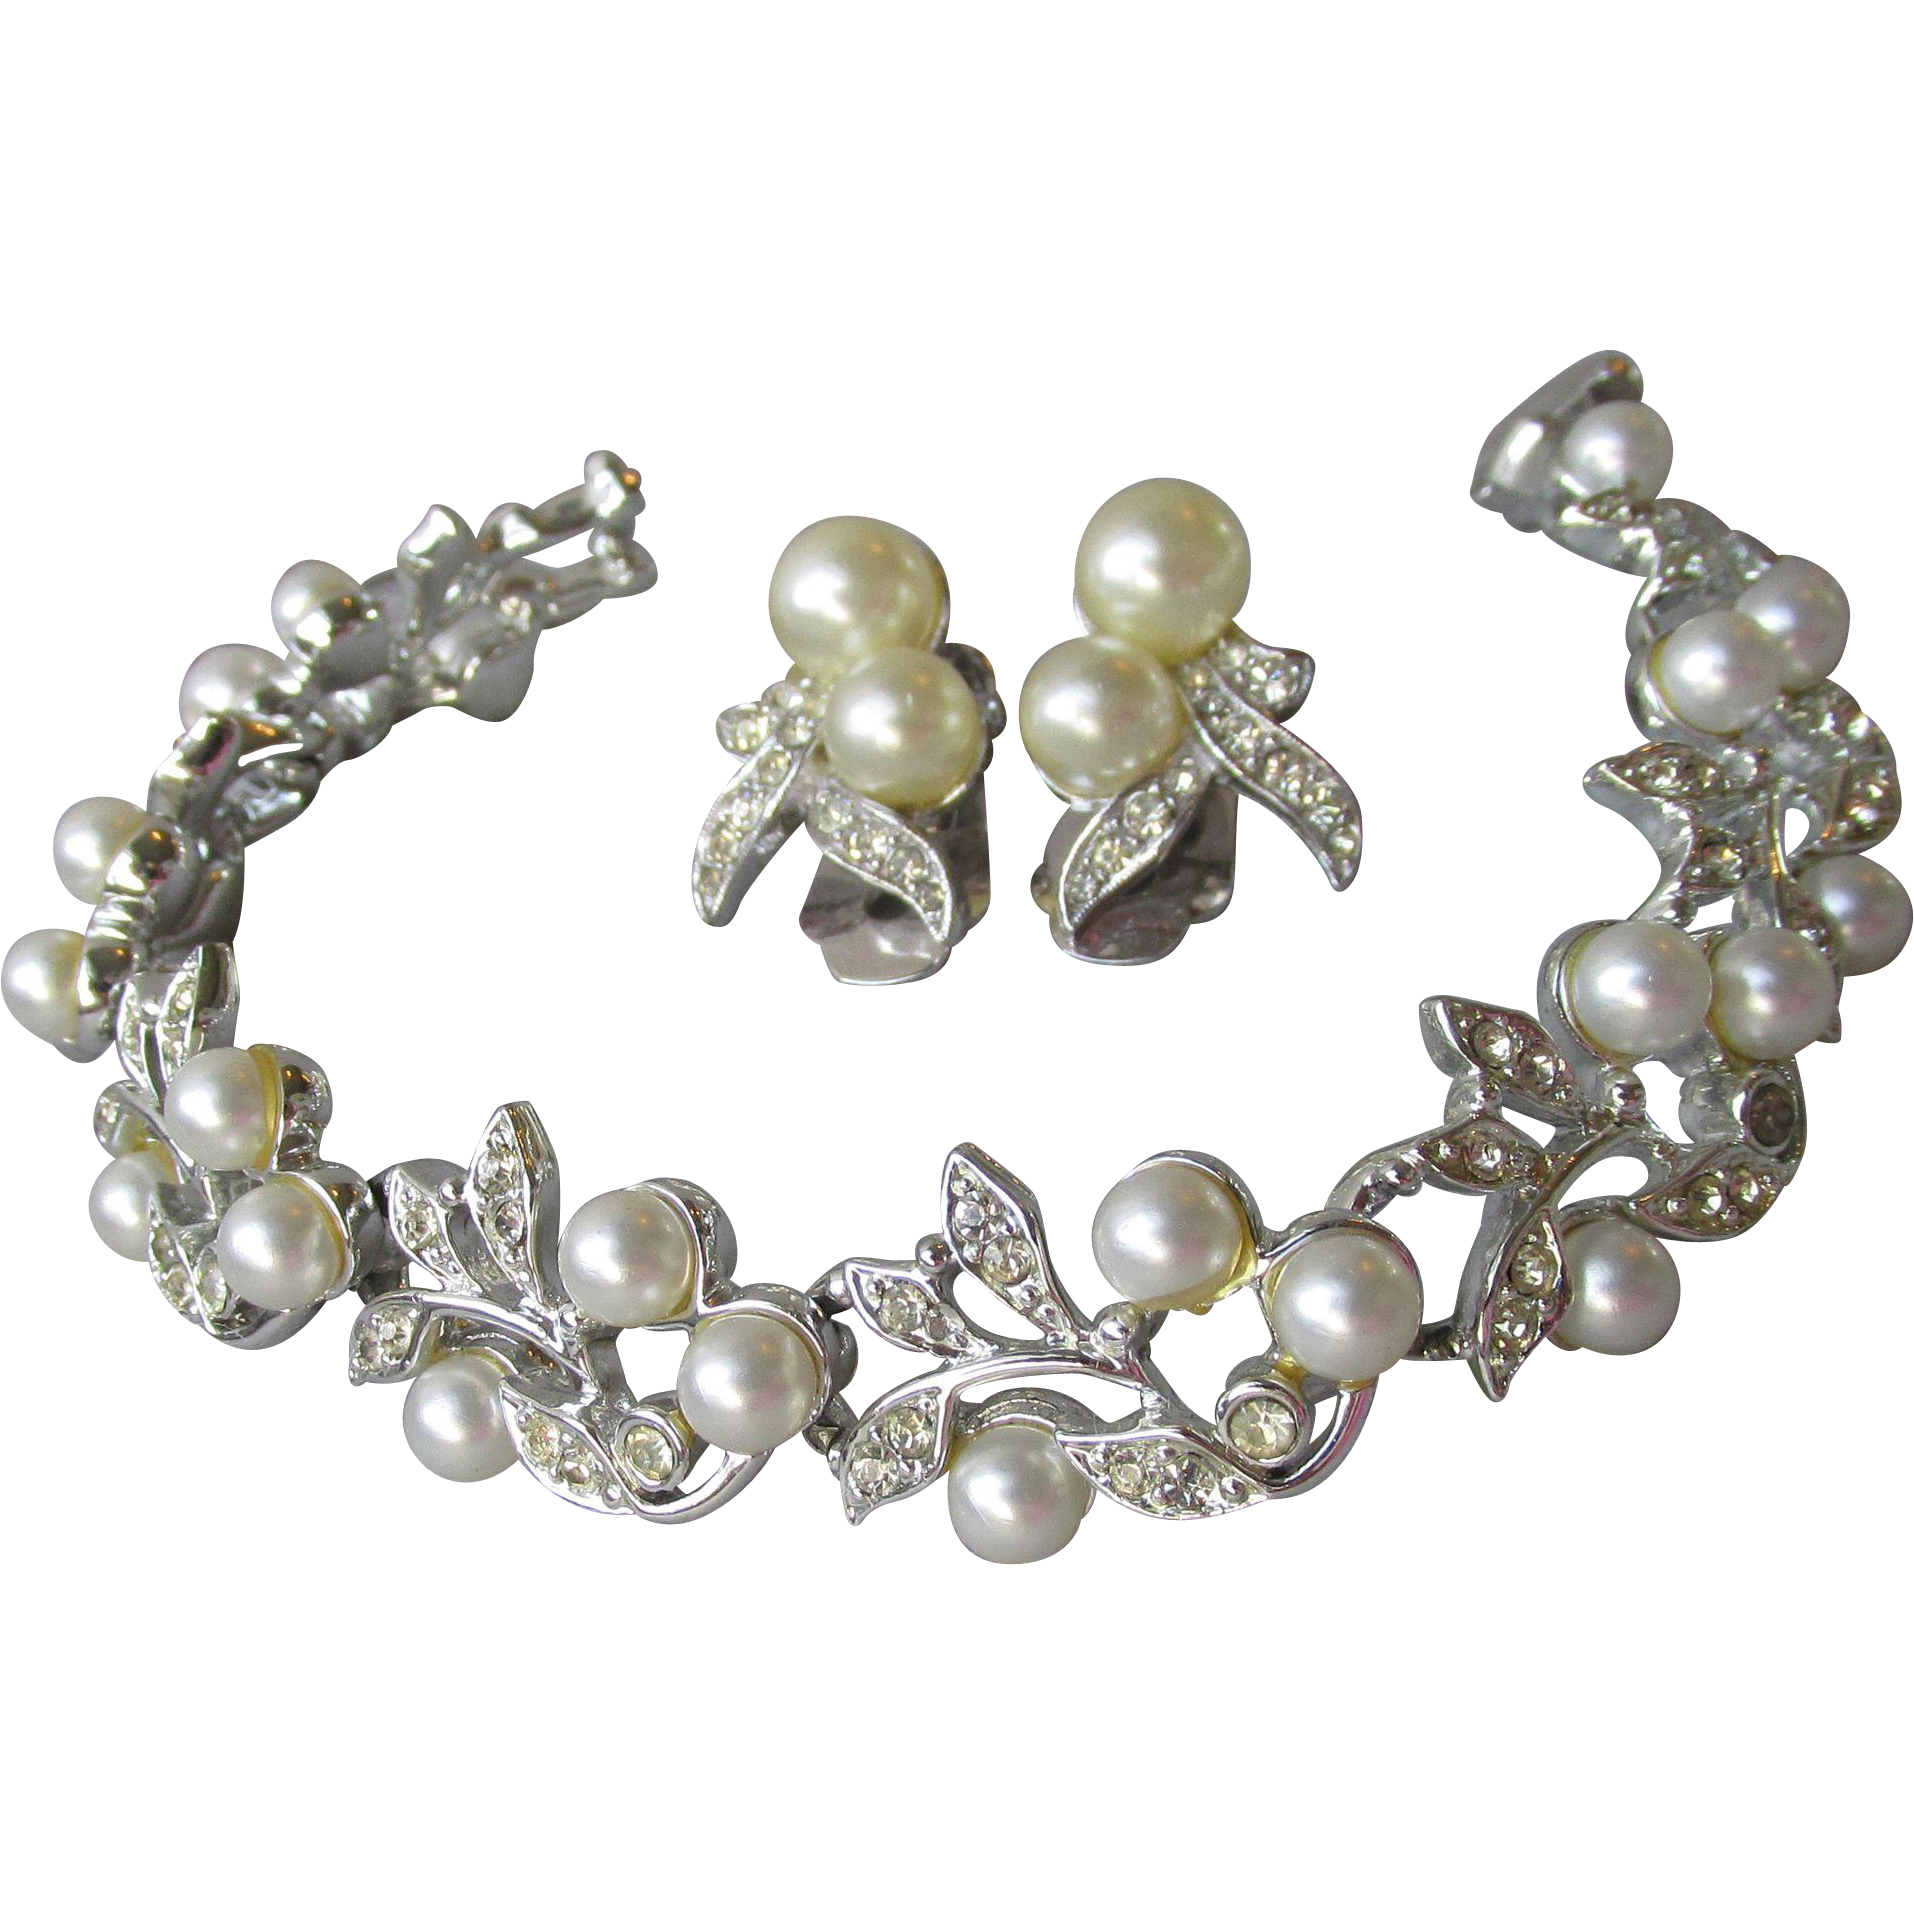 Signed Marvella Faux Pearl & Rhinestone Rhodium Plated Bracelet & Earrings Set, Vintage 1960's Demi Parure